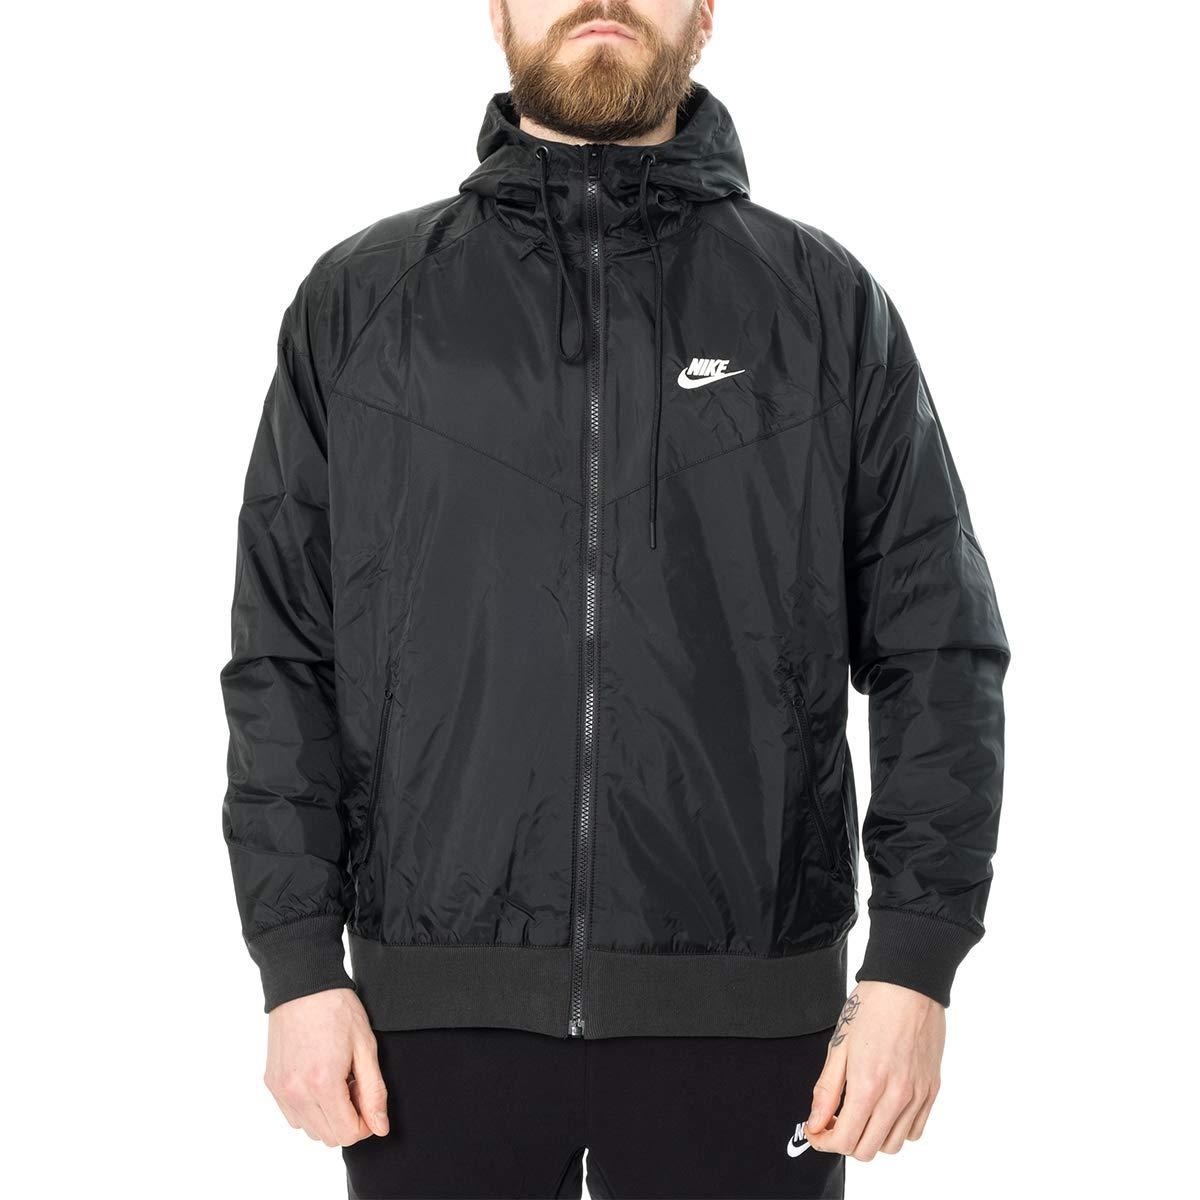 3dac374ac3dcd Nike Mens Windrunner Hooded Track Jacket